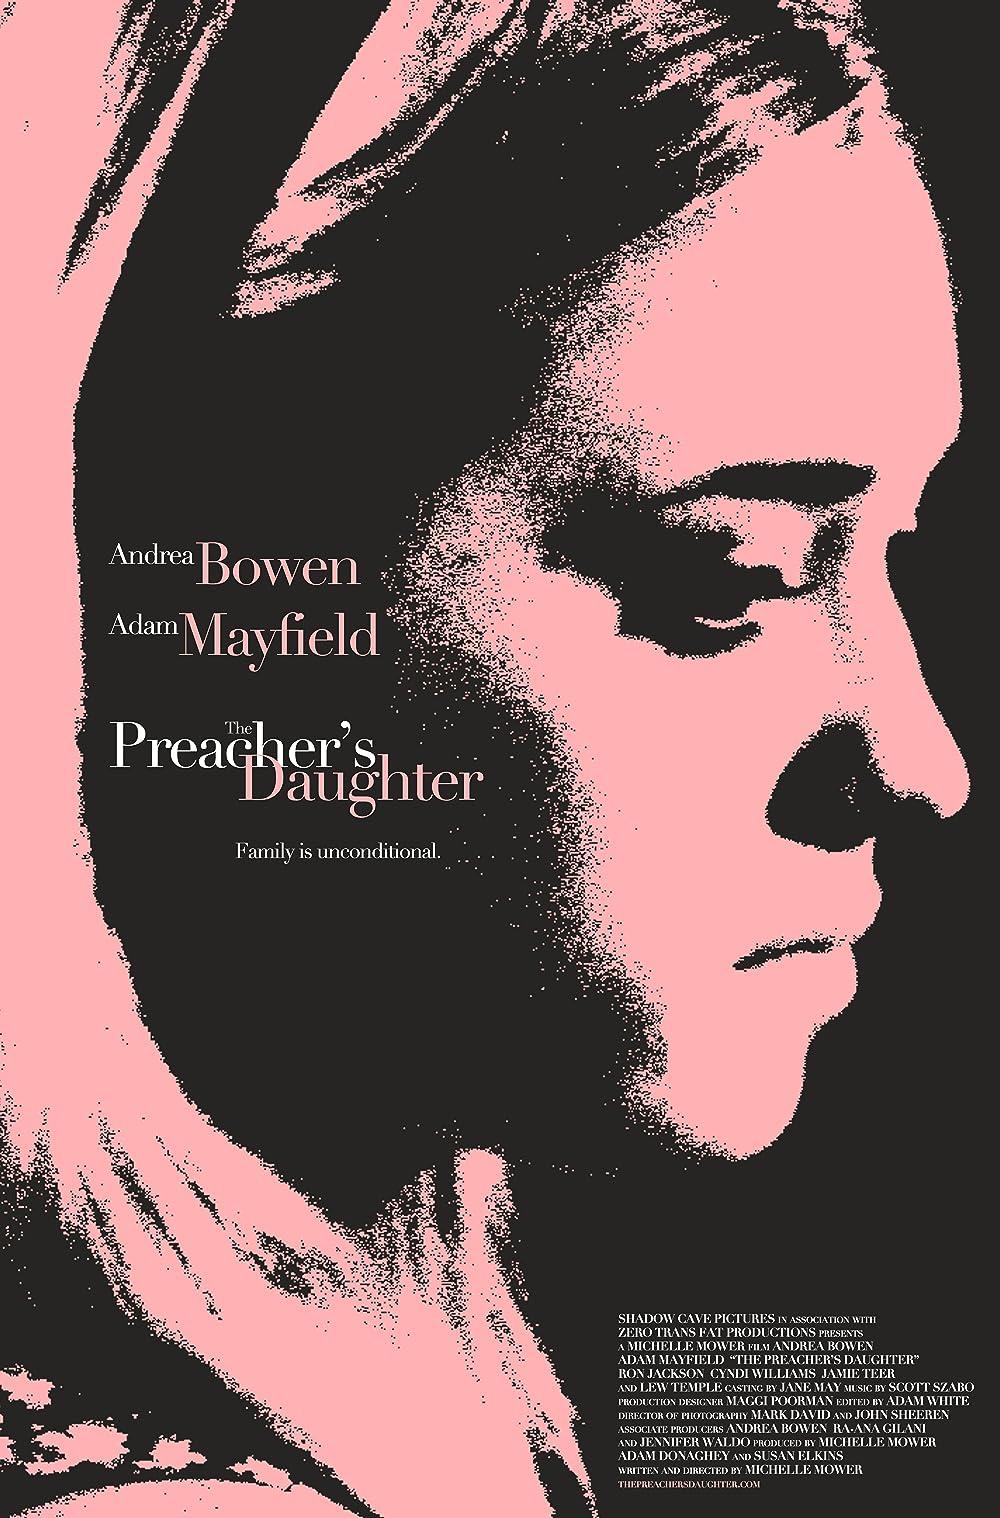 Movie cast preachers daughter the Preachers' Daughters